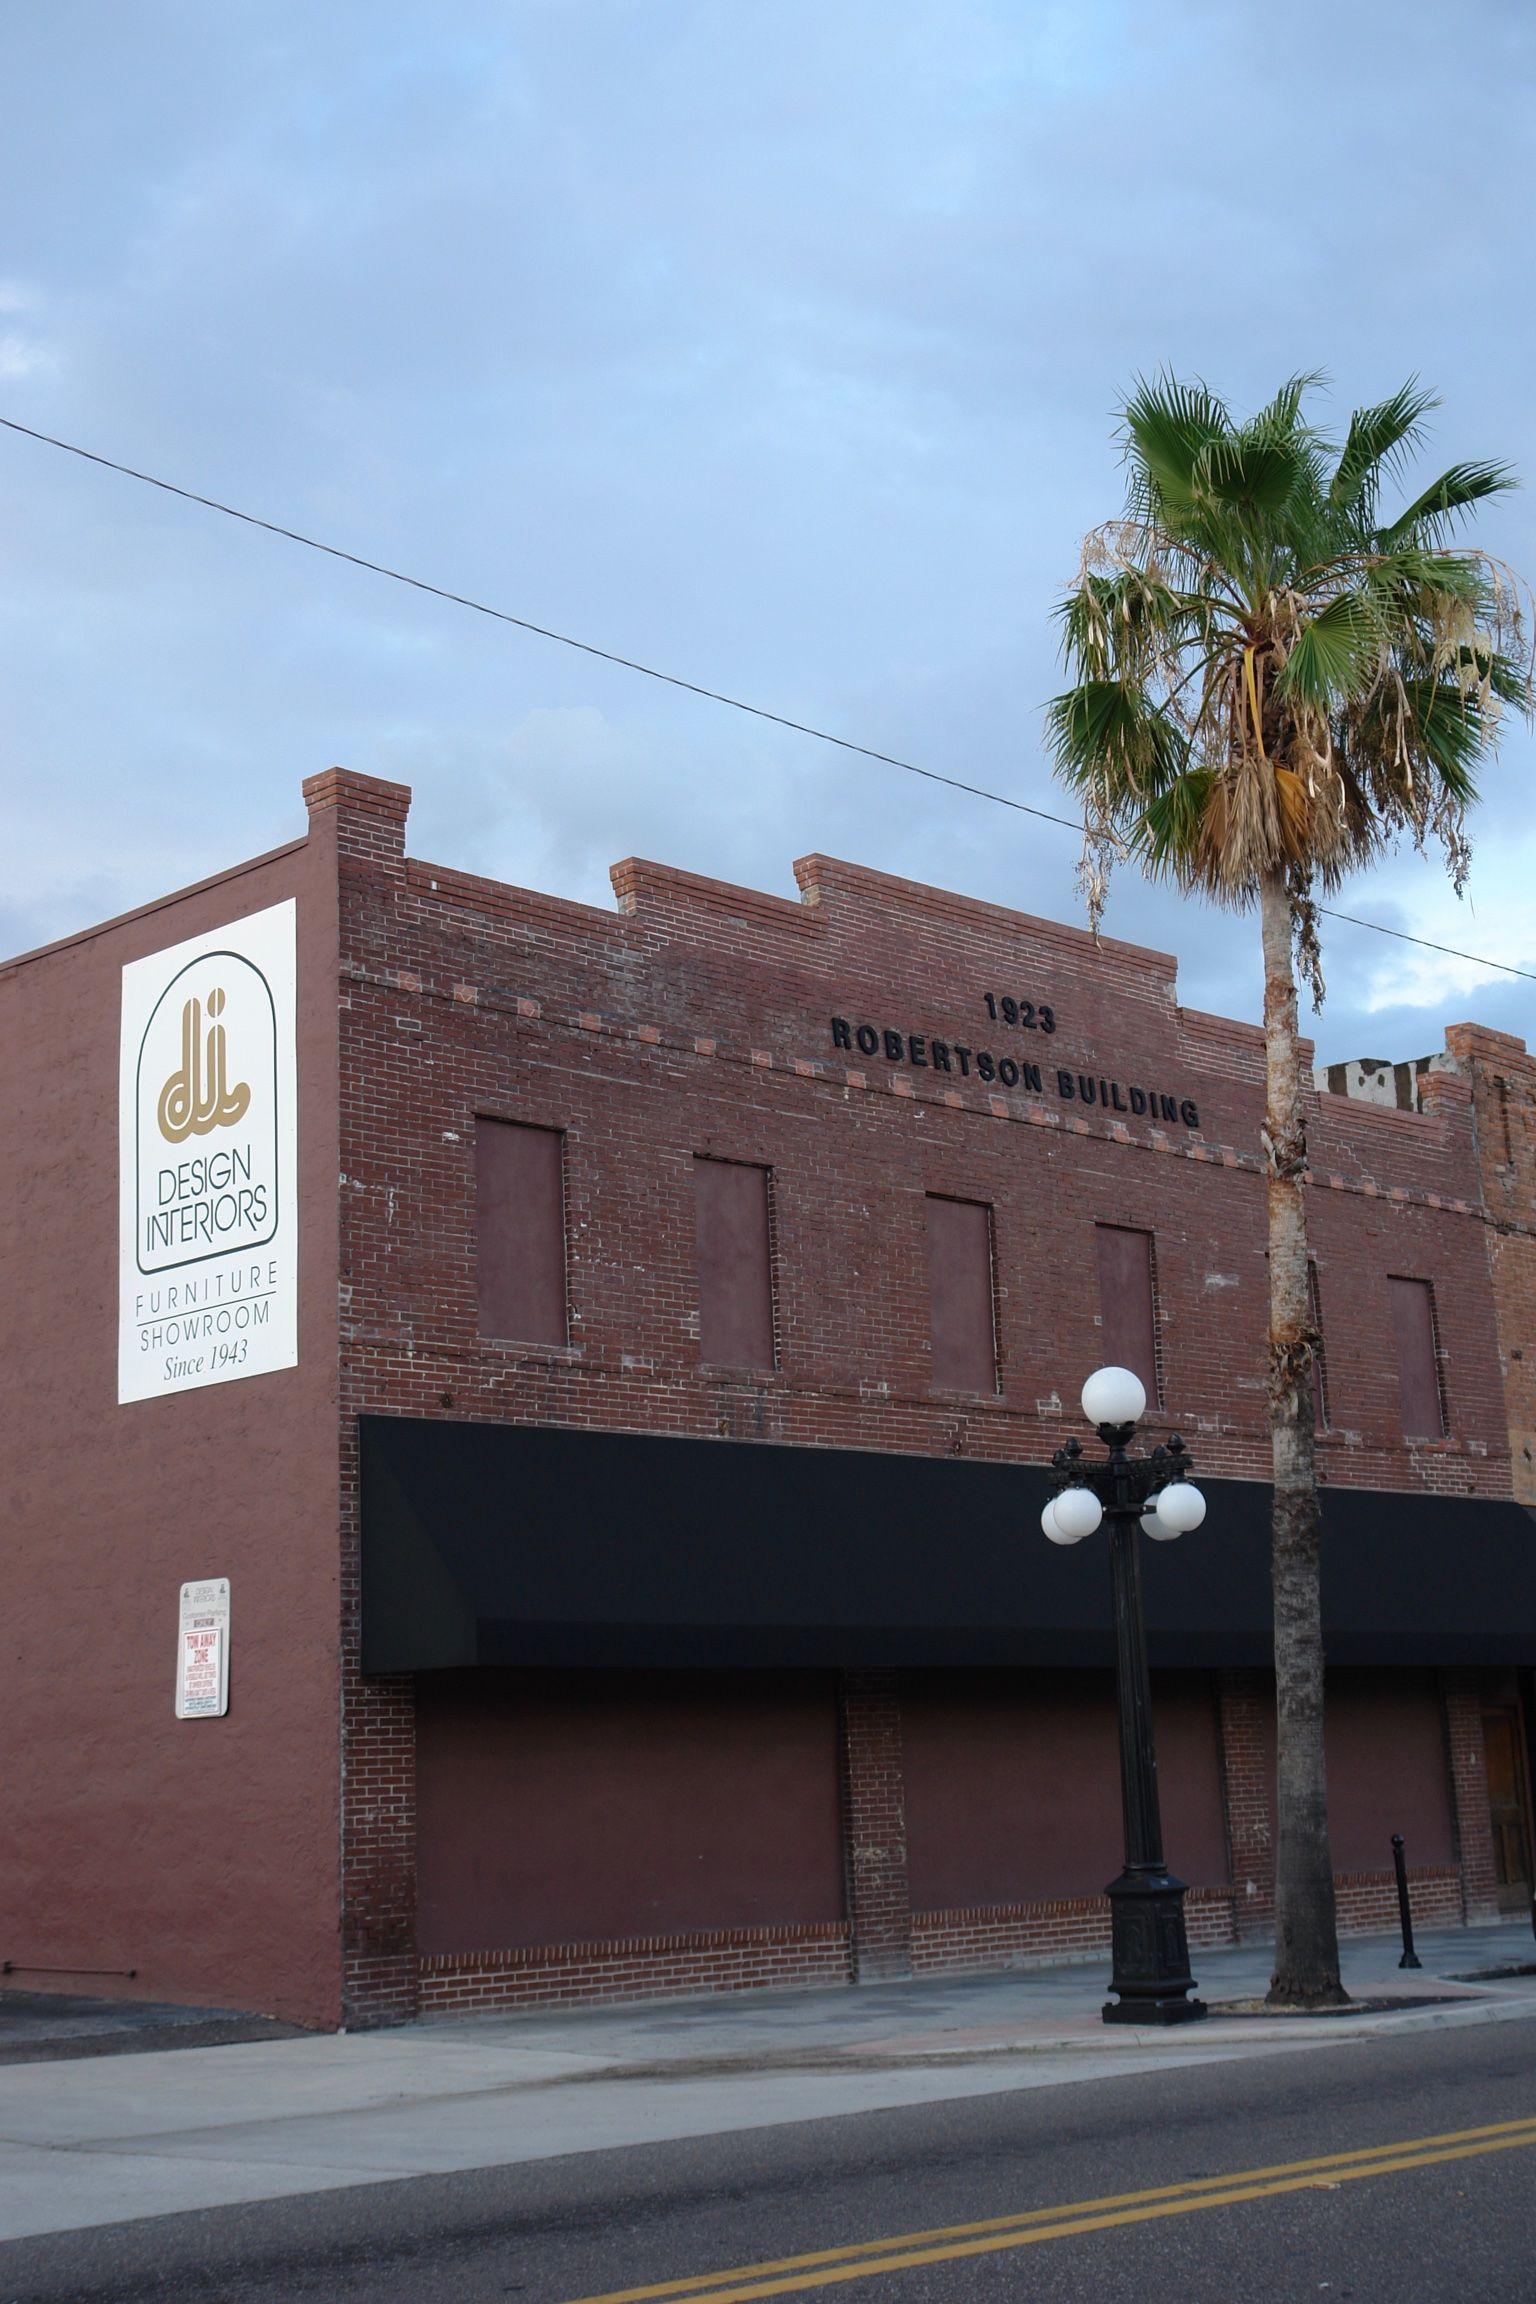 Ybor City, Tampa, Florida #yborcity #tampa #florida